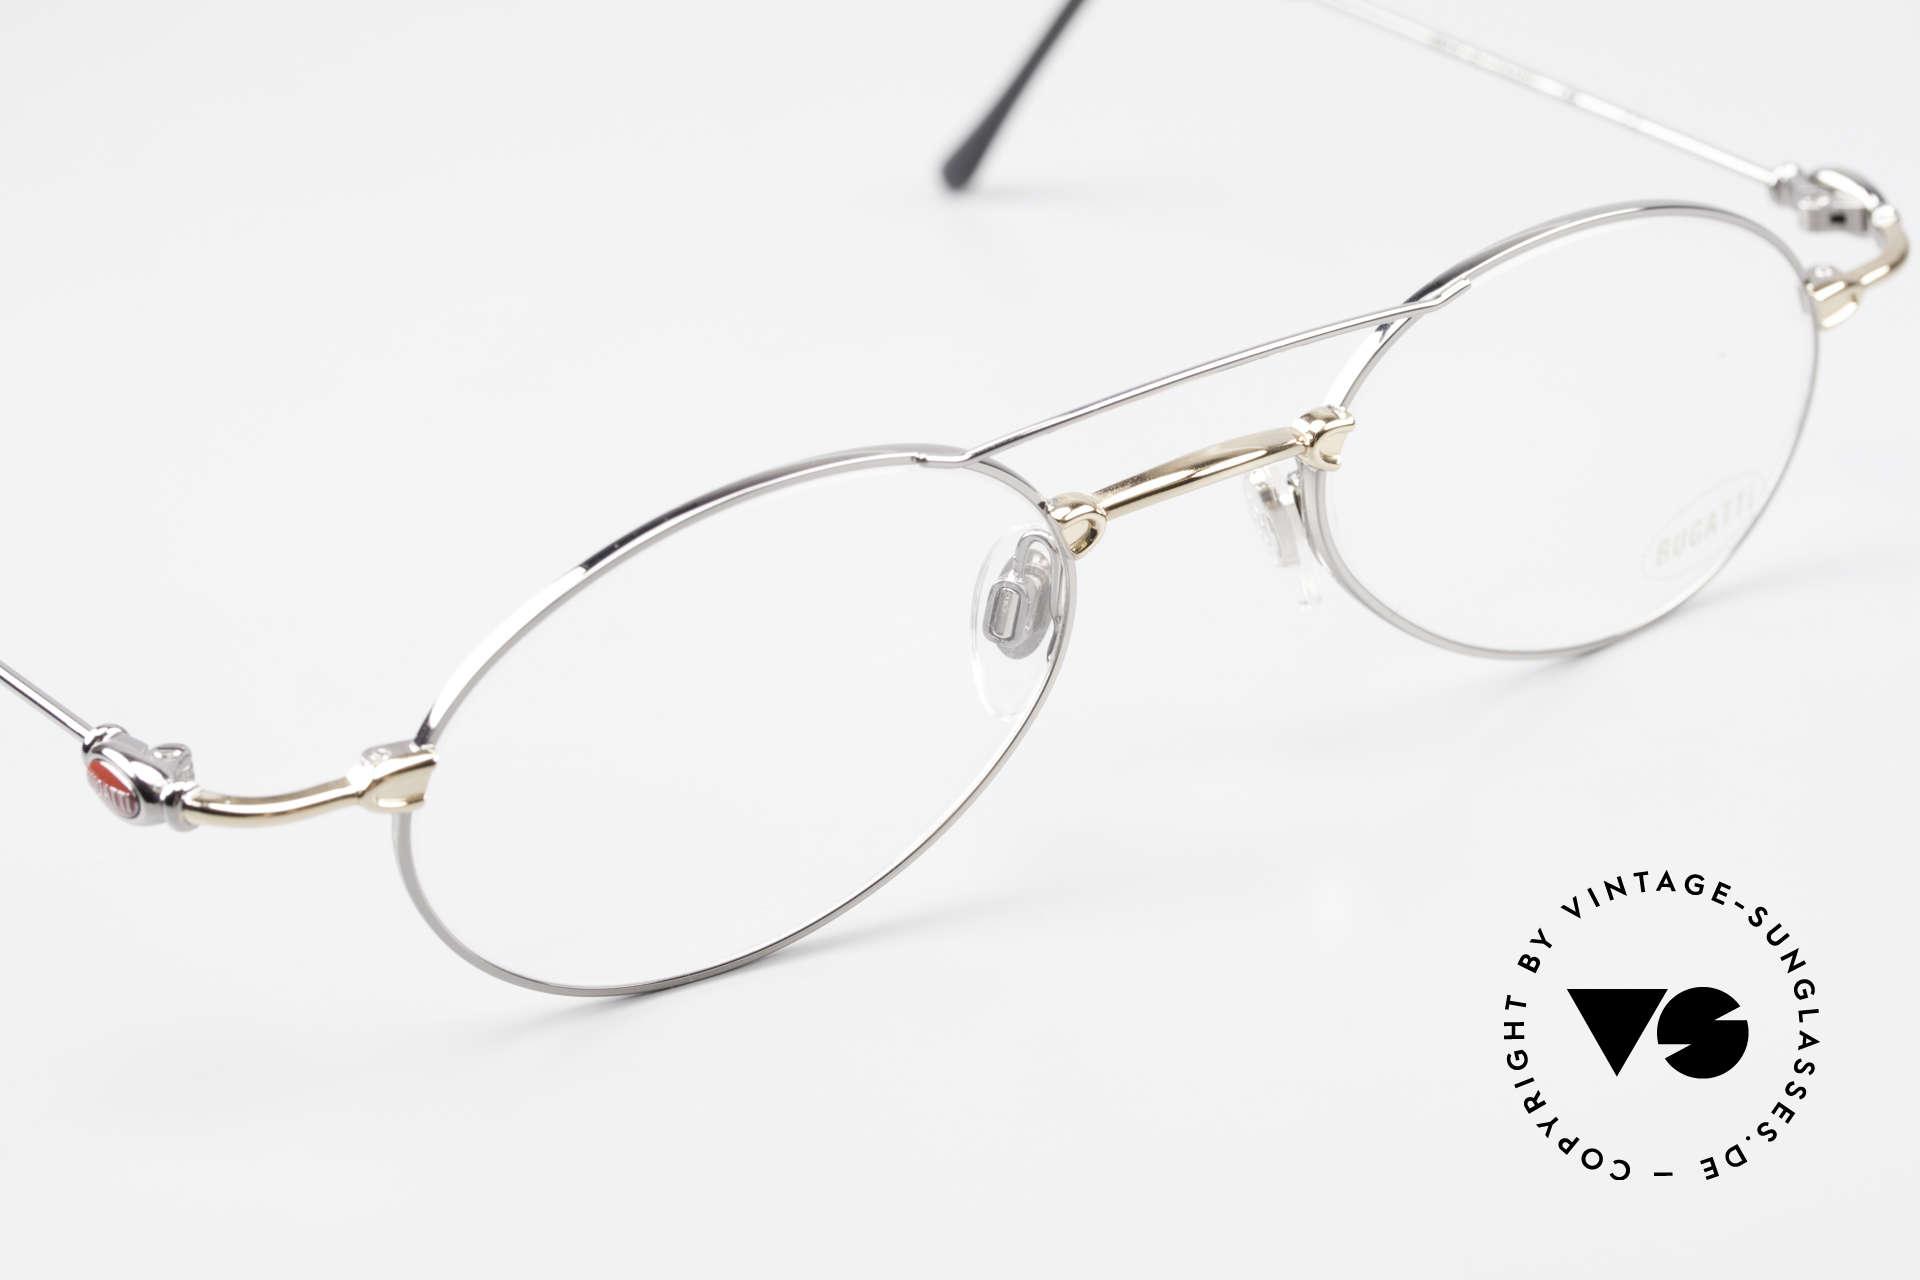 Bugatti 10892 Vintage Men's Eyeglasses 90's, NO retro fashion, but a unique 15 years old original!, Made for Men